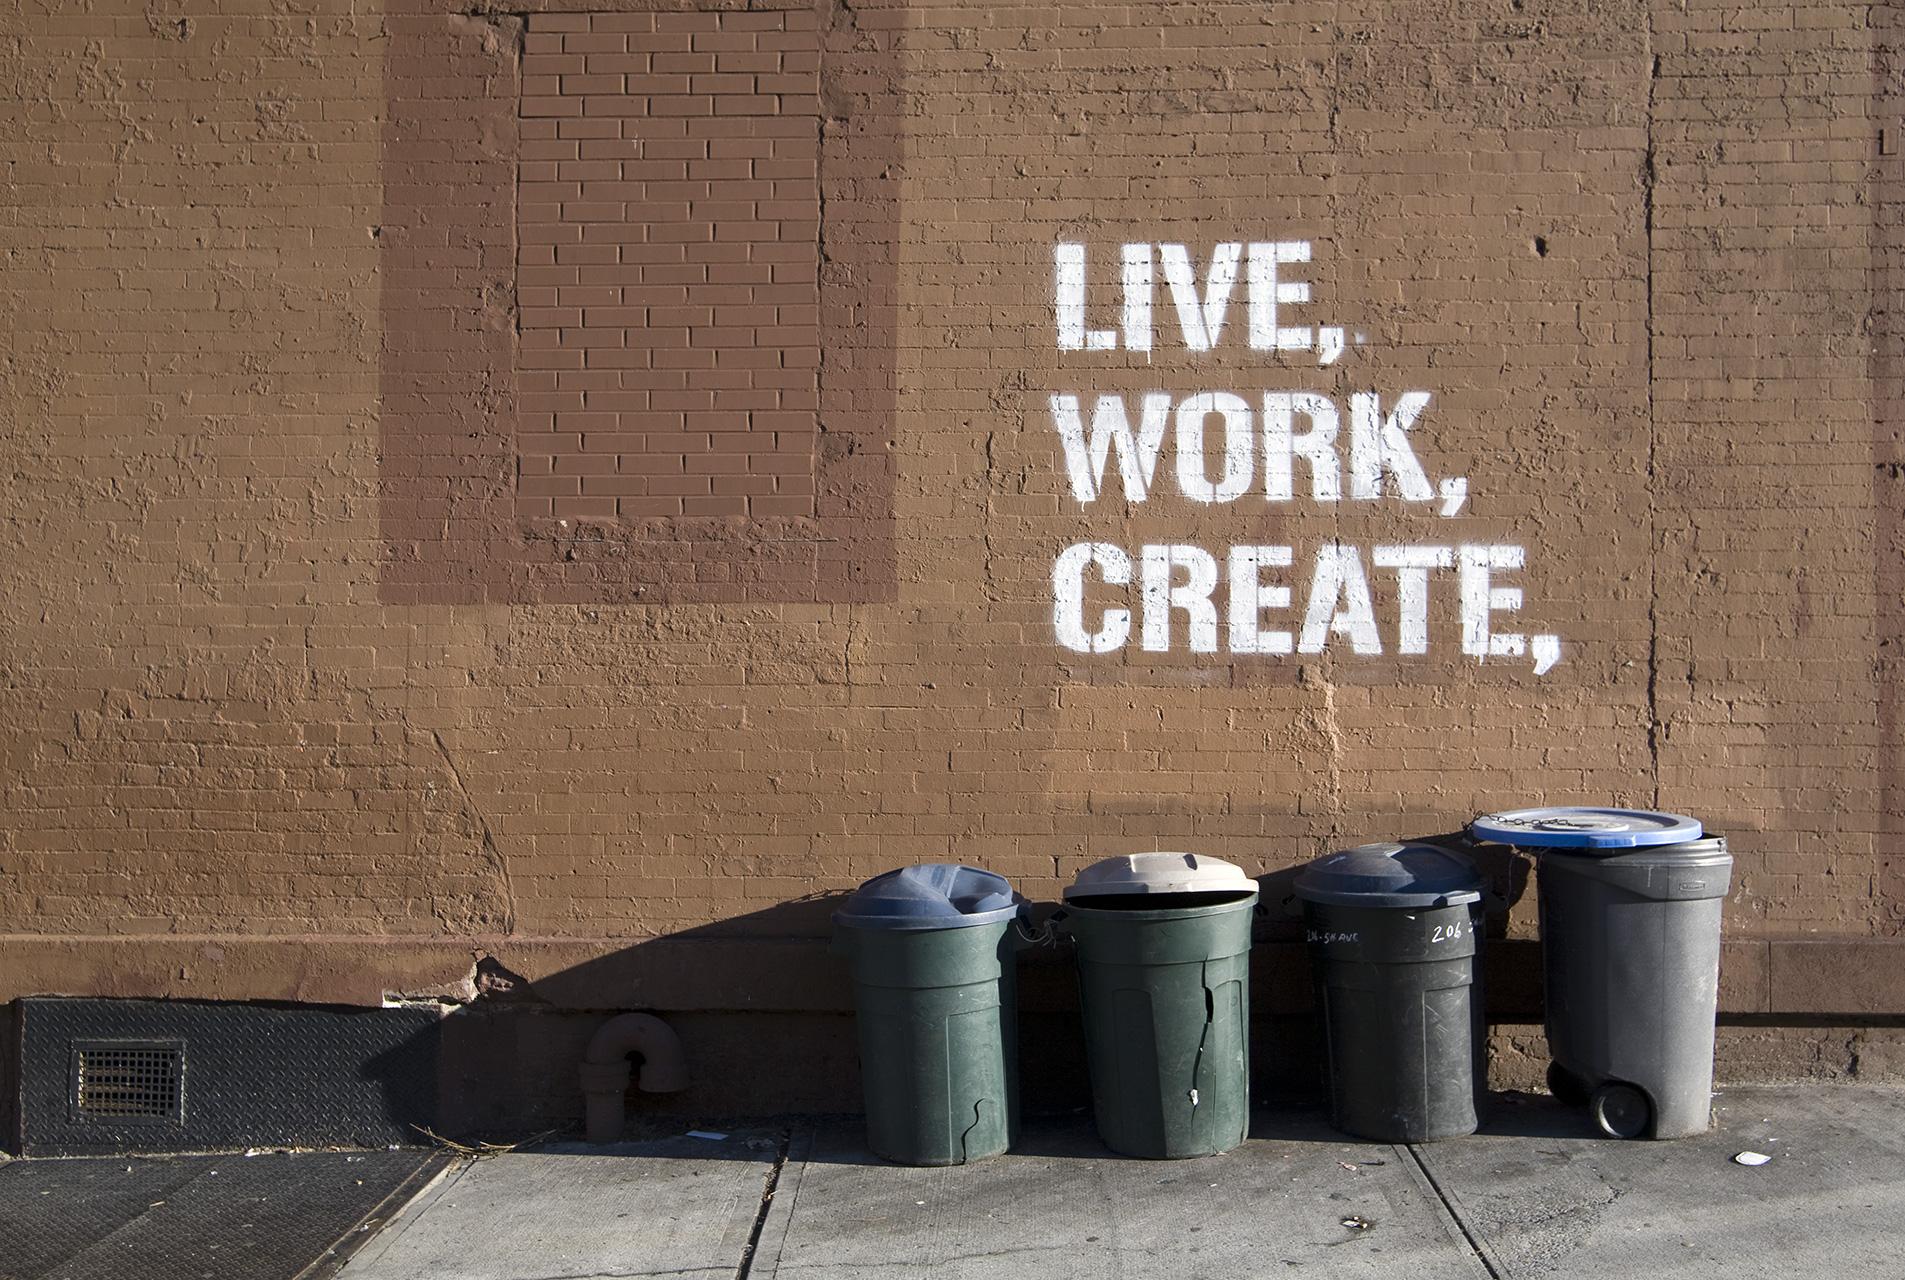 Live_Work_Create_Garbage